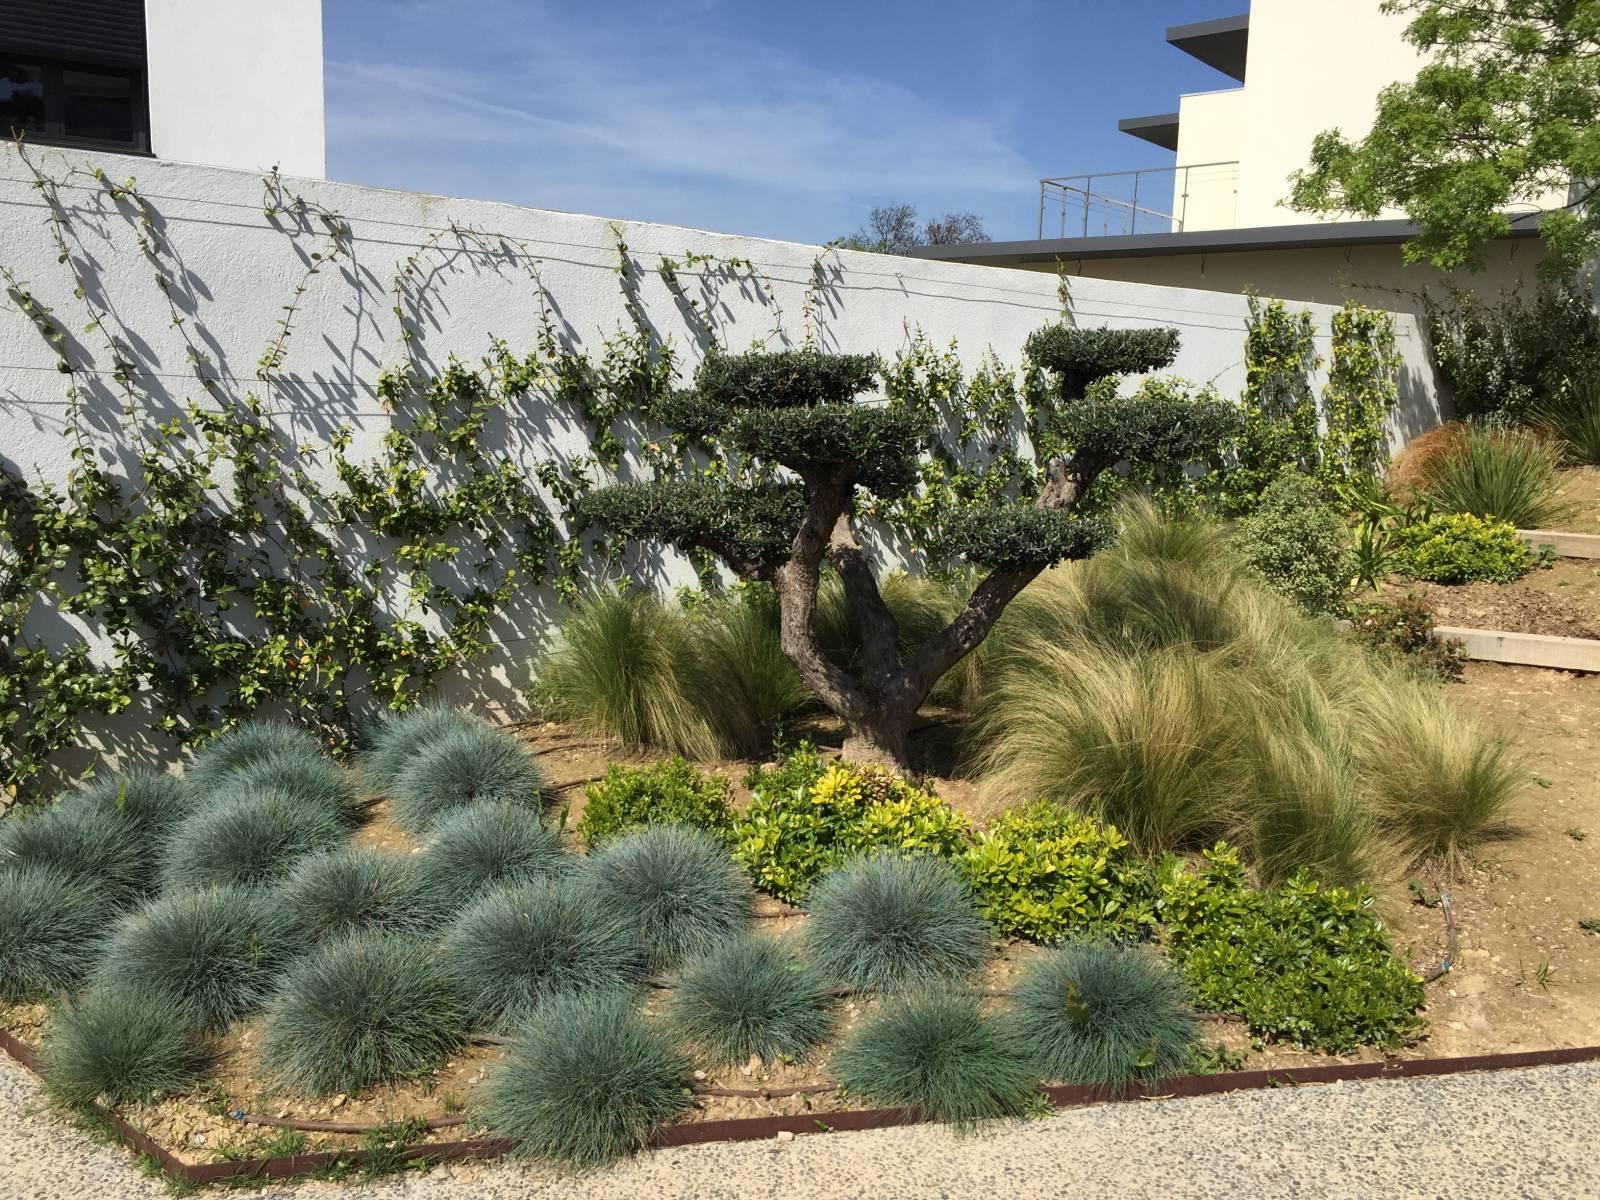 Am nagement jardins entretien espaces verts marseille for Entretien jardin 34